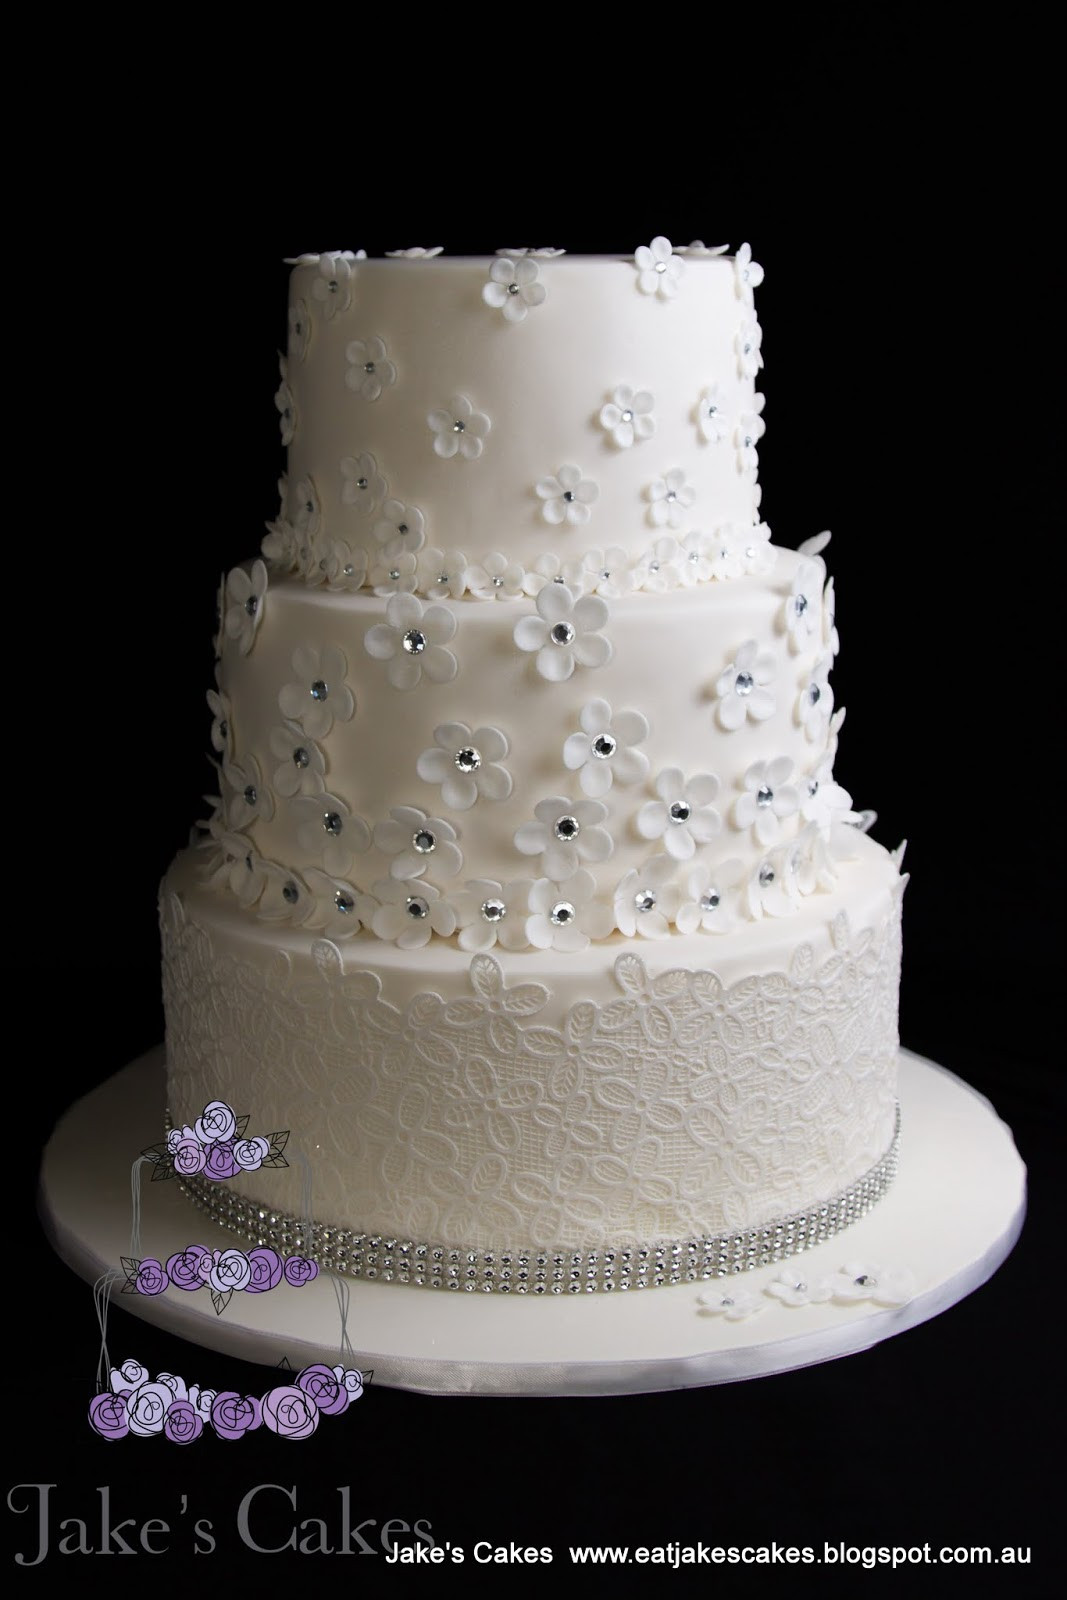 Wedding Cakes With Bling  Jake s Cakes Flower Bling wedding cake